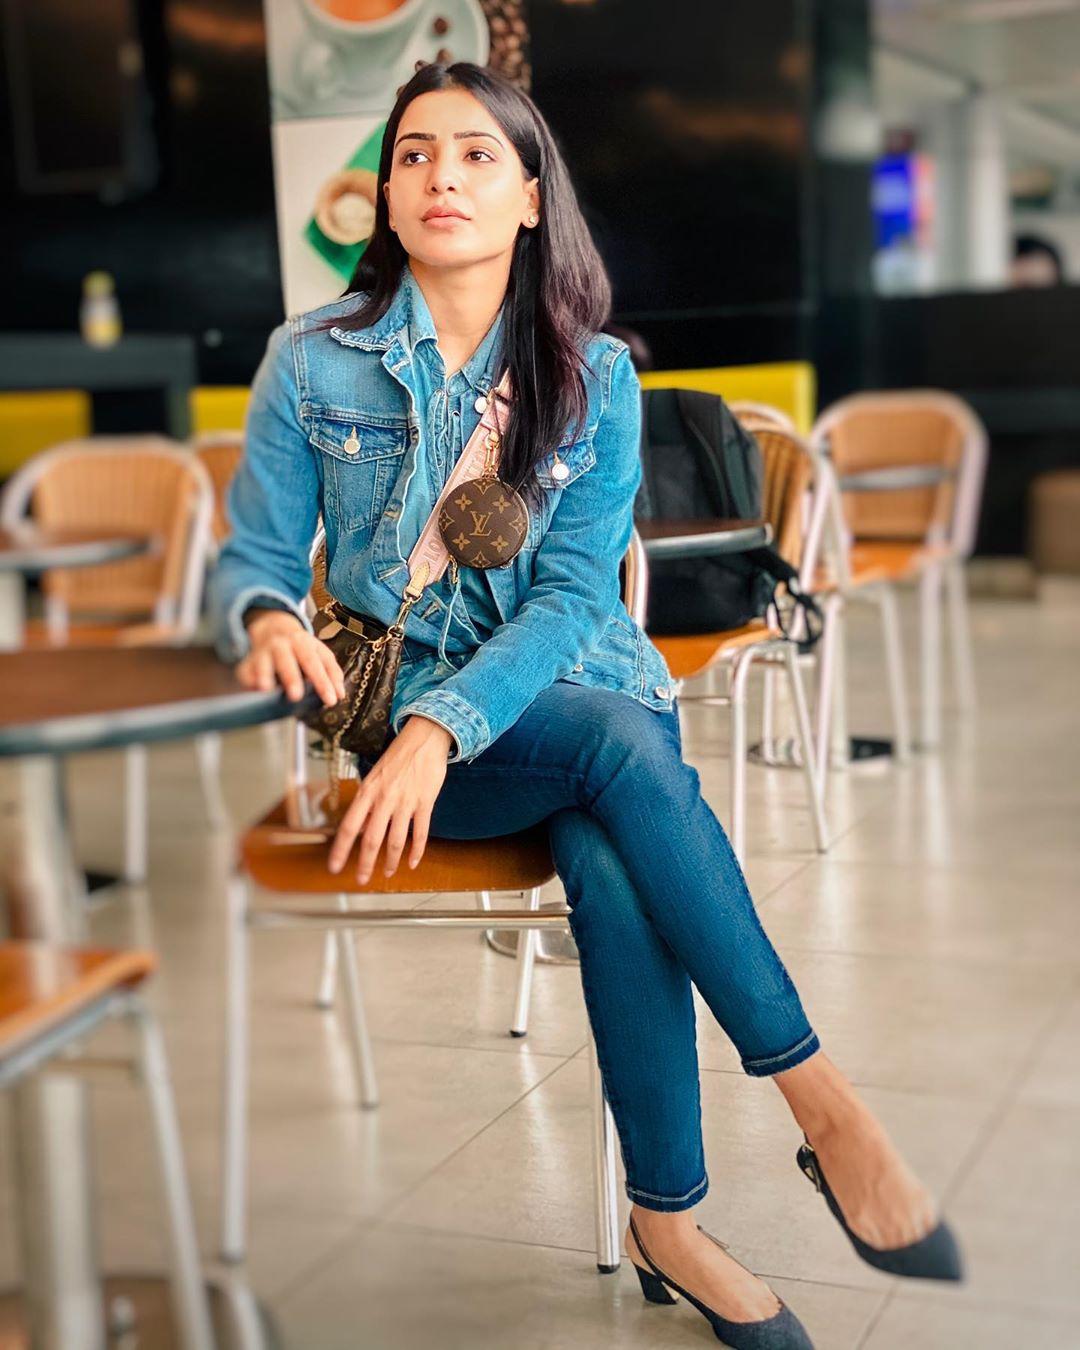 Samantha-Akkineni-Wallpapers-Insta-Fit-Bio-1